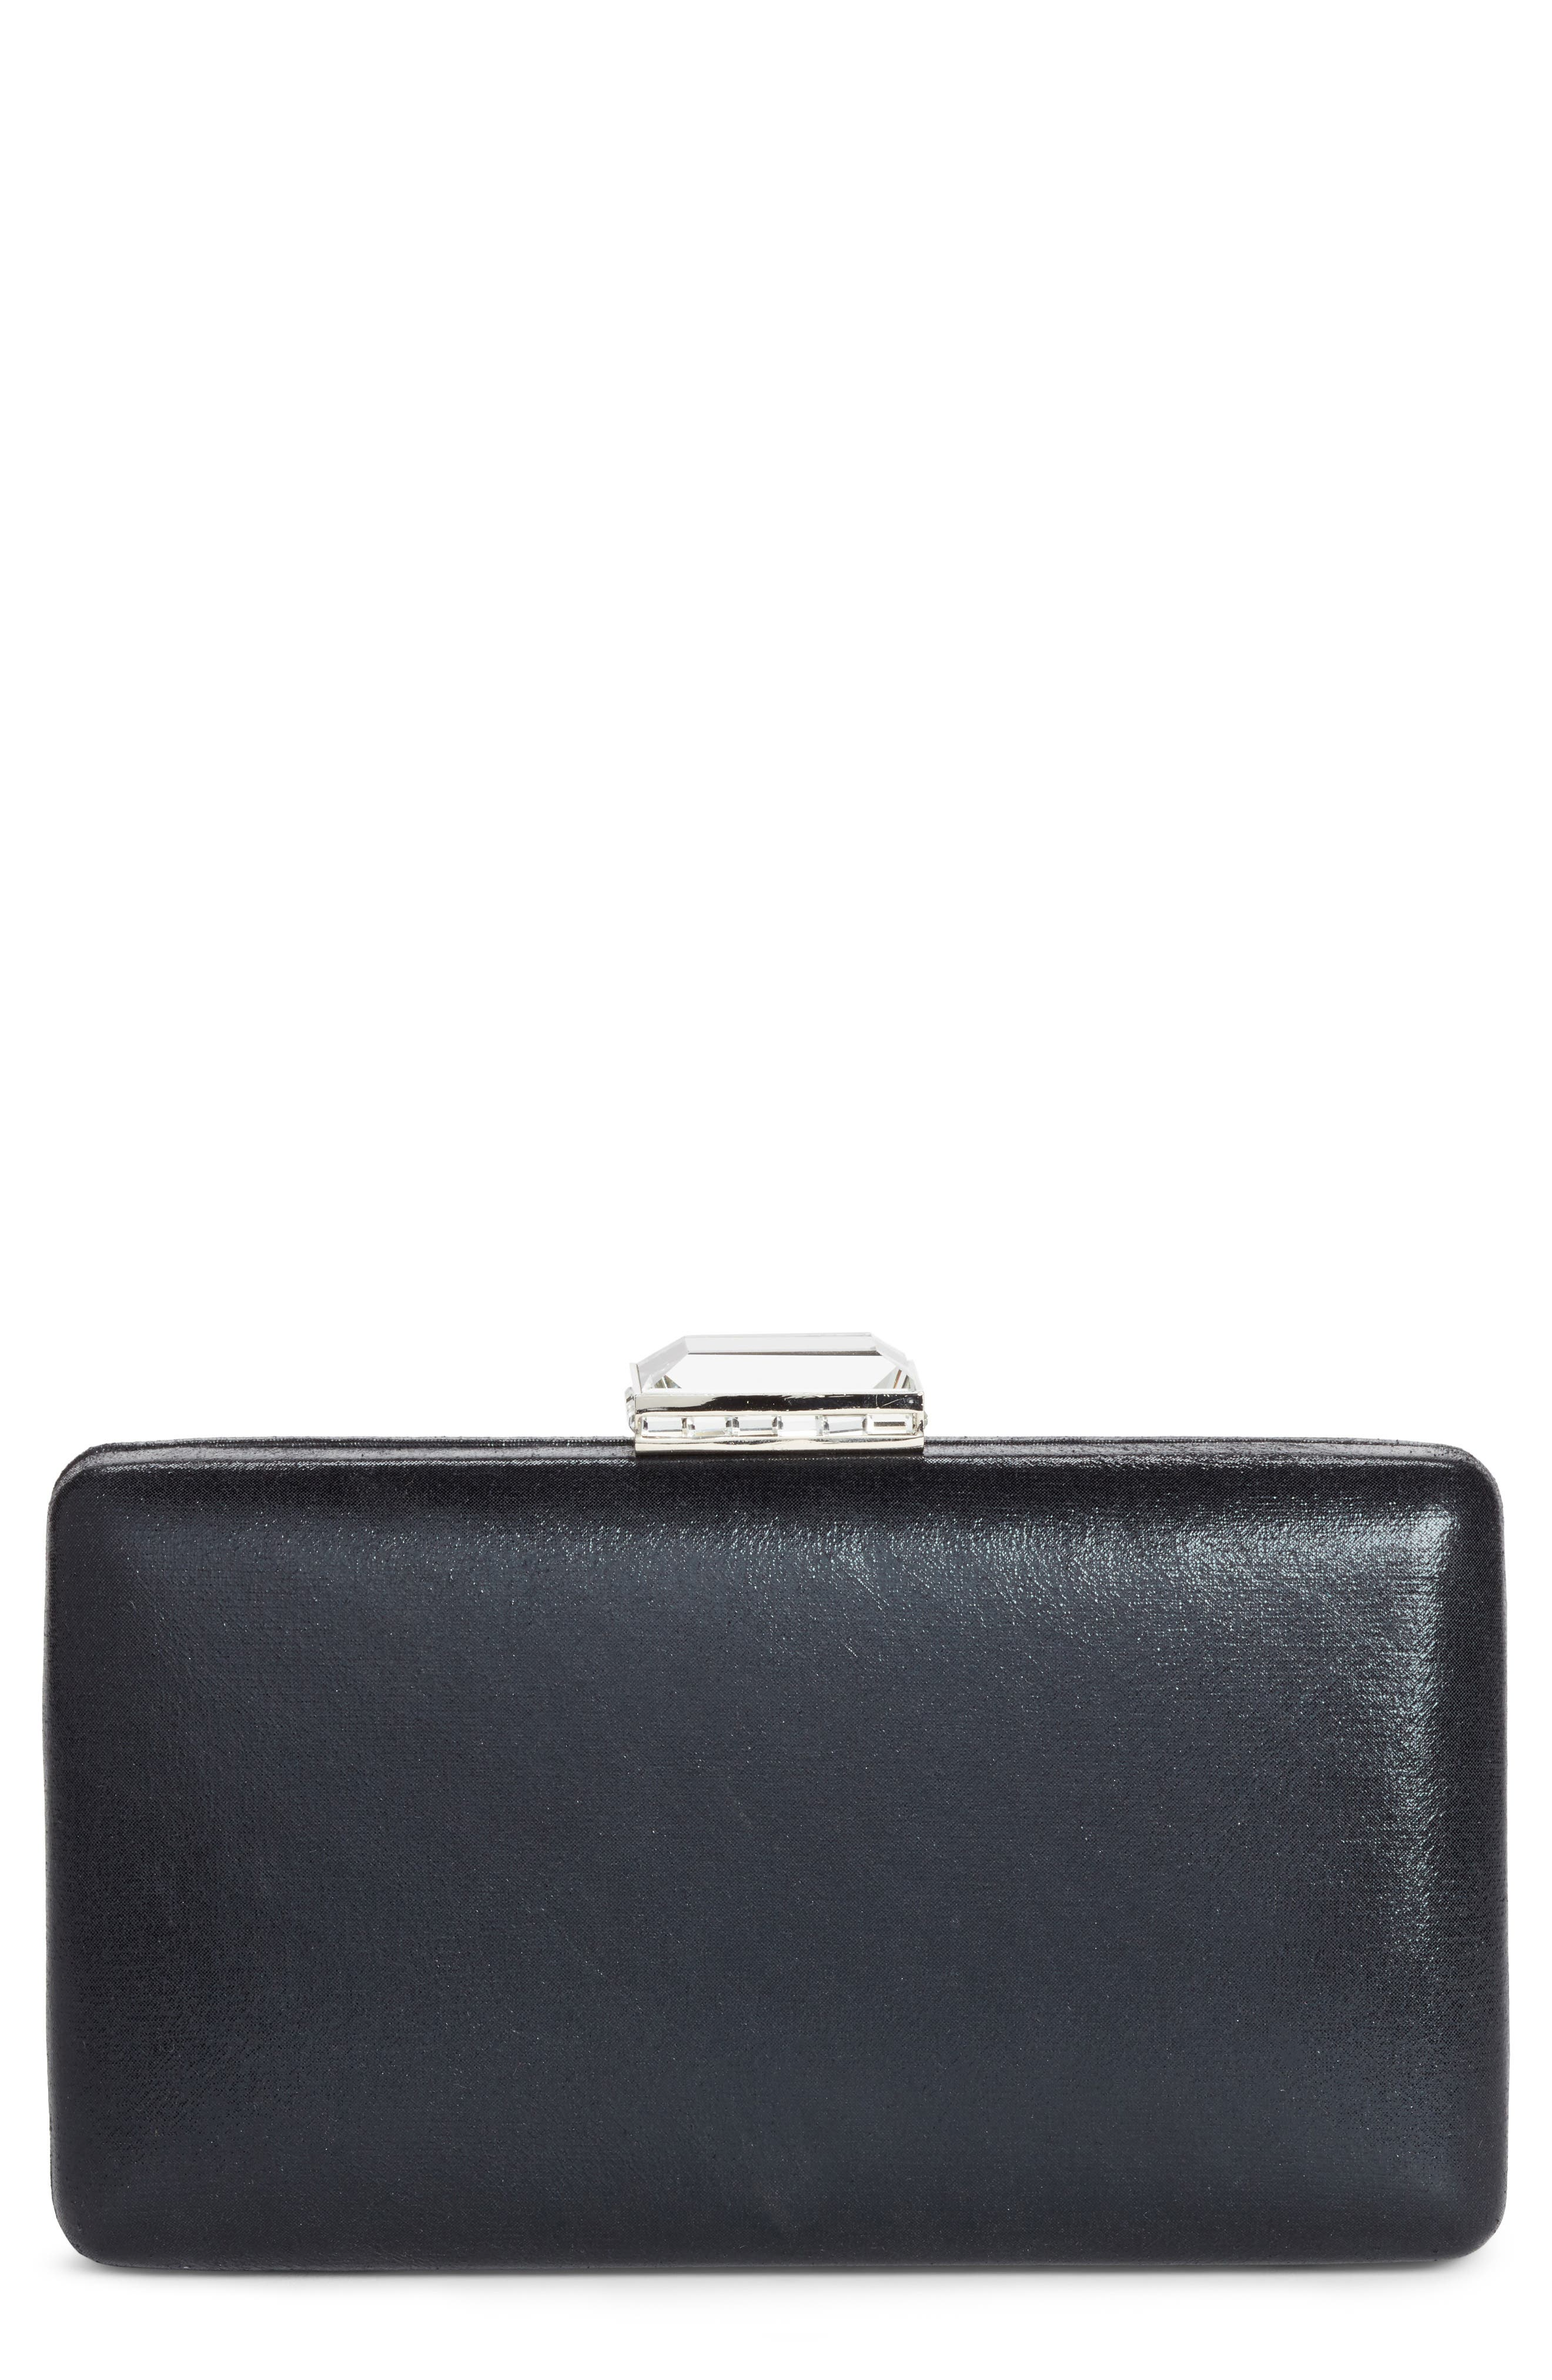 Metallic Box Clutch,                         Main,                         color, BLACK